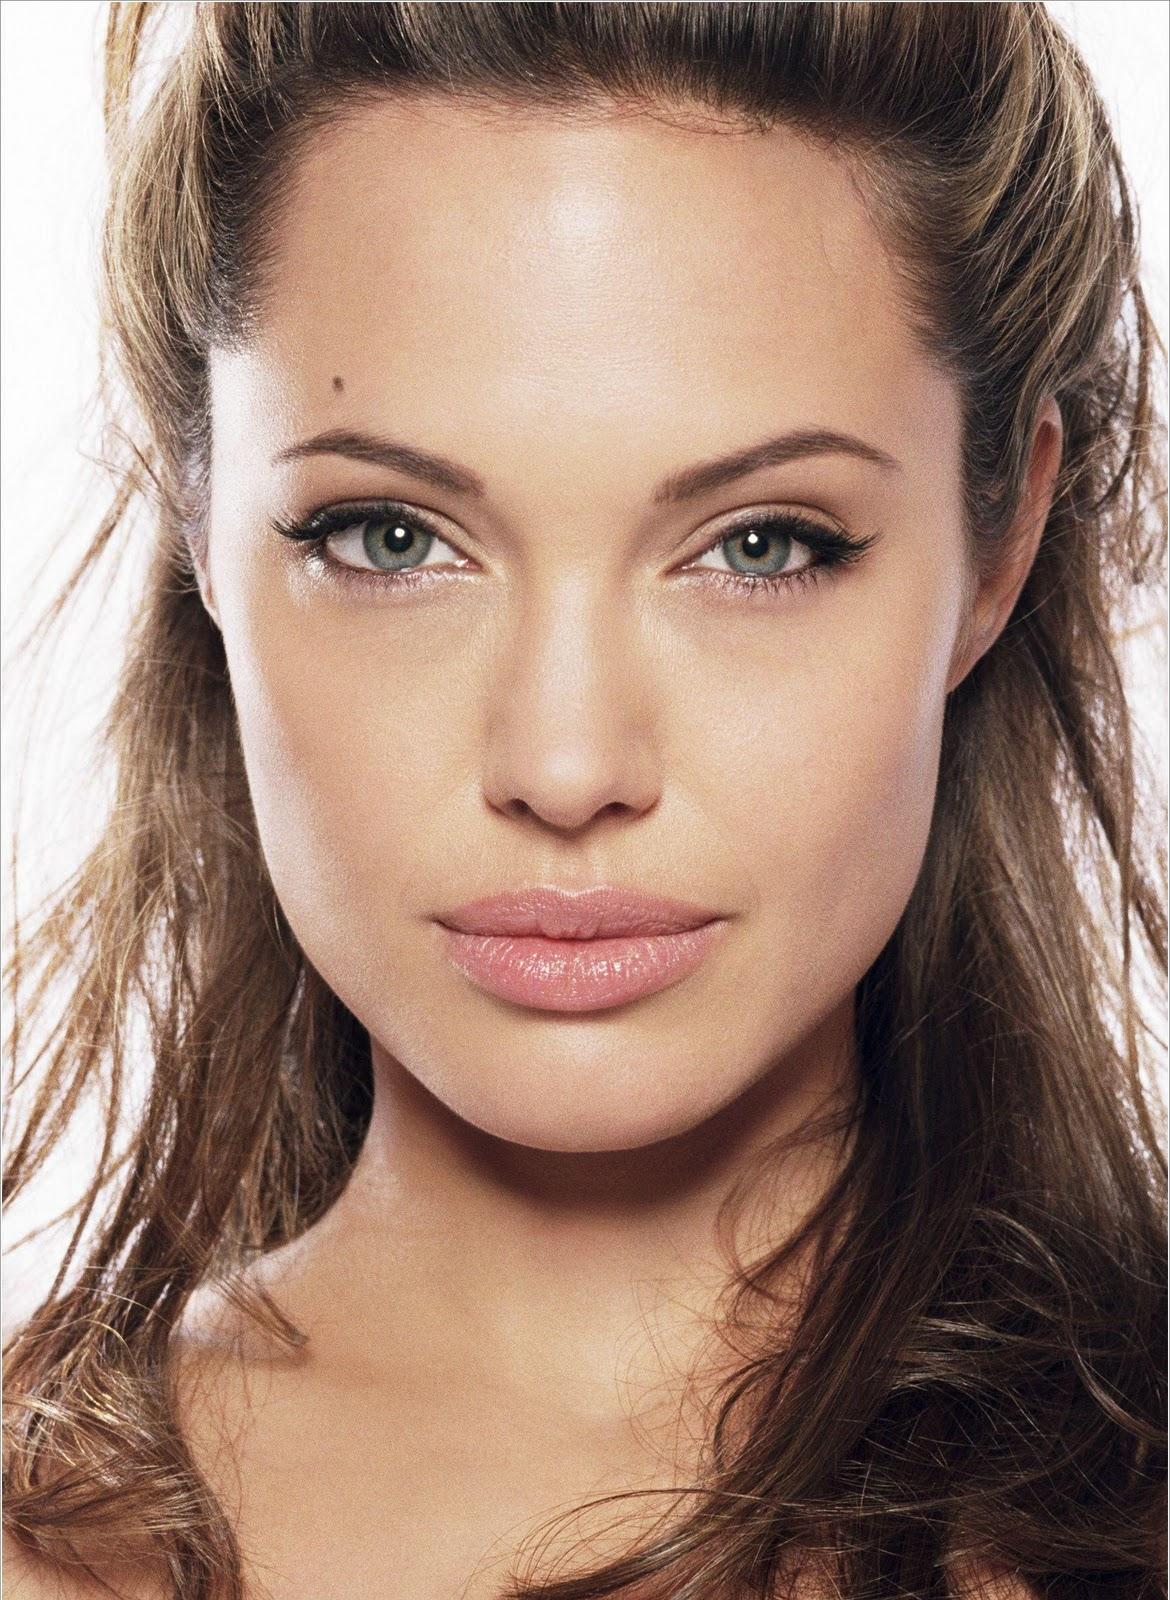 http://4.bp.blogspot.com/-fnTQIsv40xc/UMN-zbNNR6I/AAAAAAAABkQ/dZULHCw7fos/s1600/Angelina+Jolie+Lips+Pics.jpg